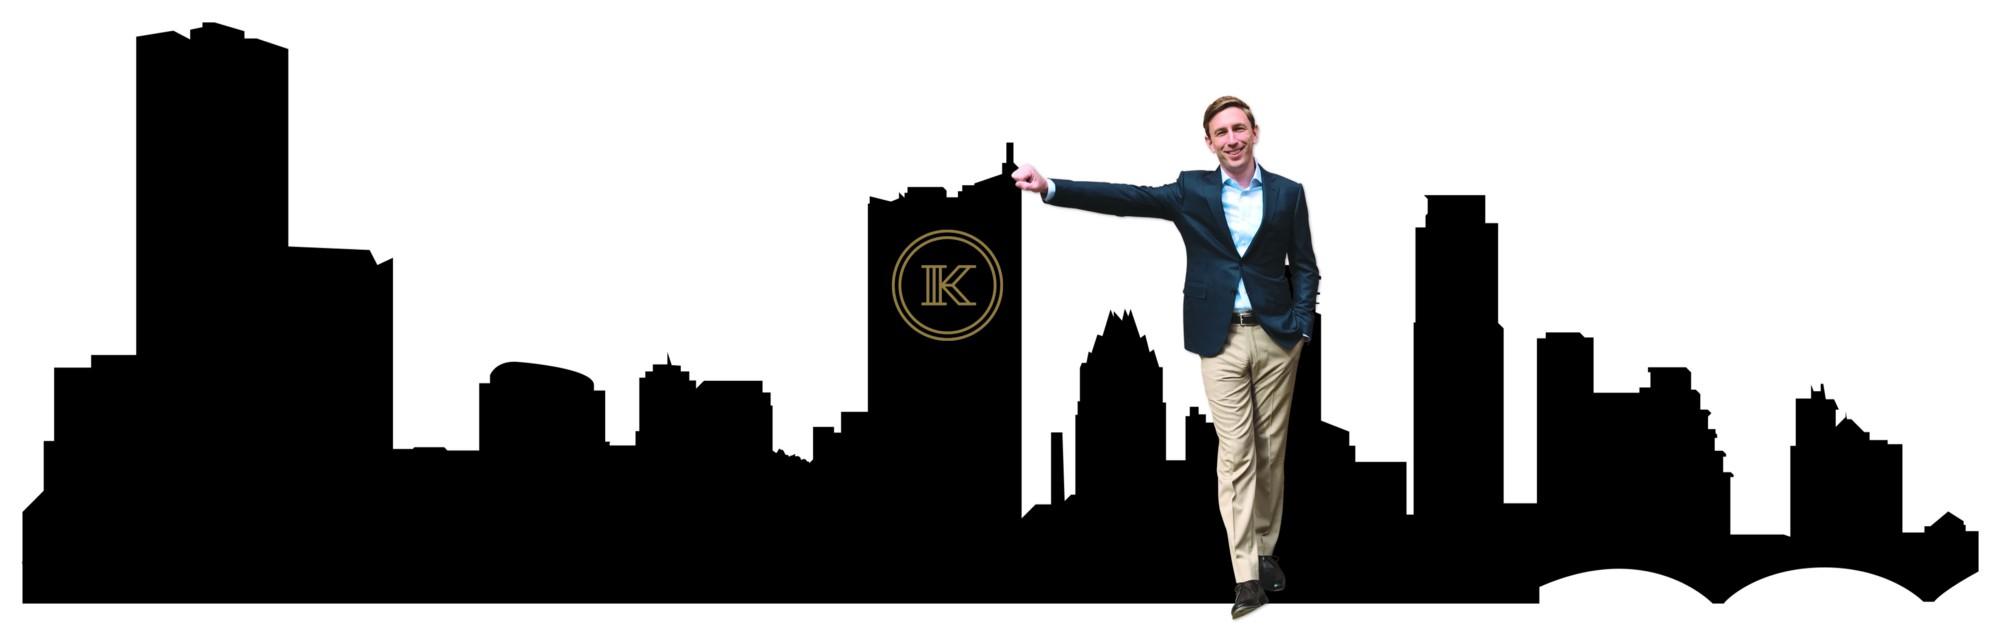 2000x625 City Profiles Austin Kiddar Capital Medium